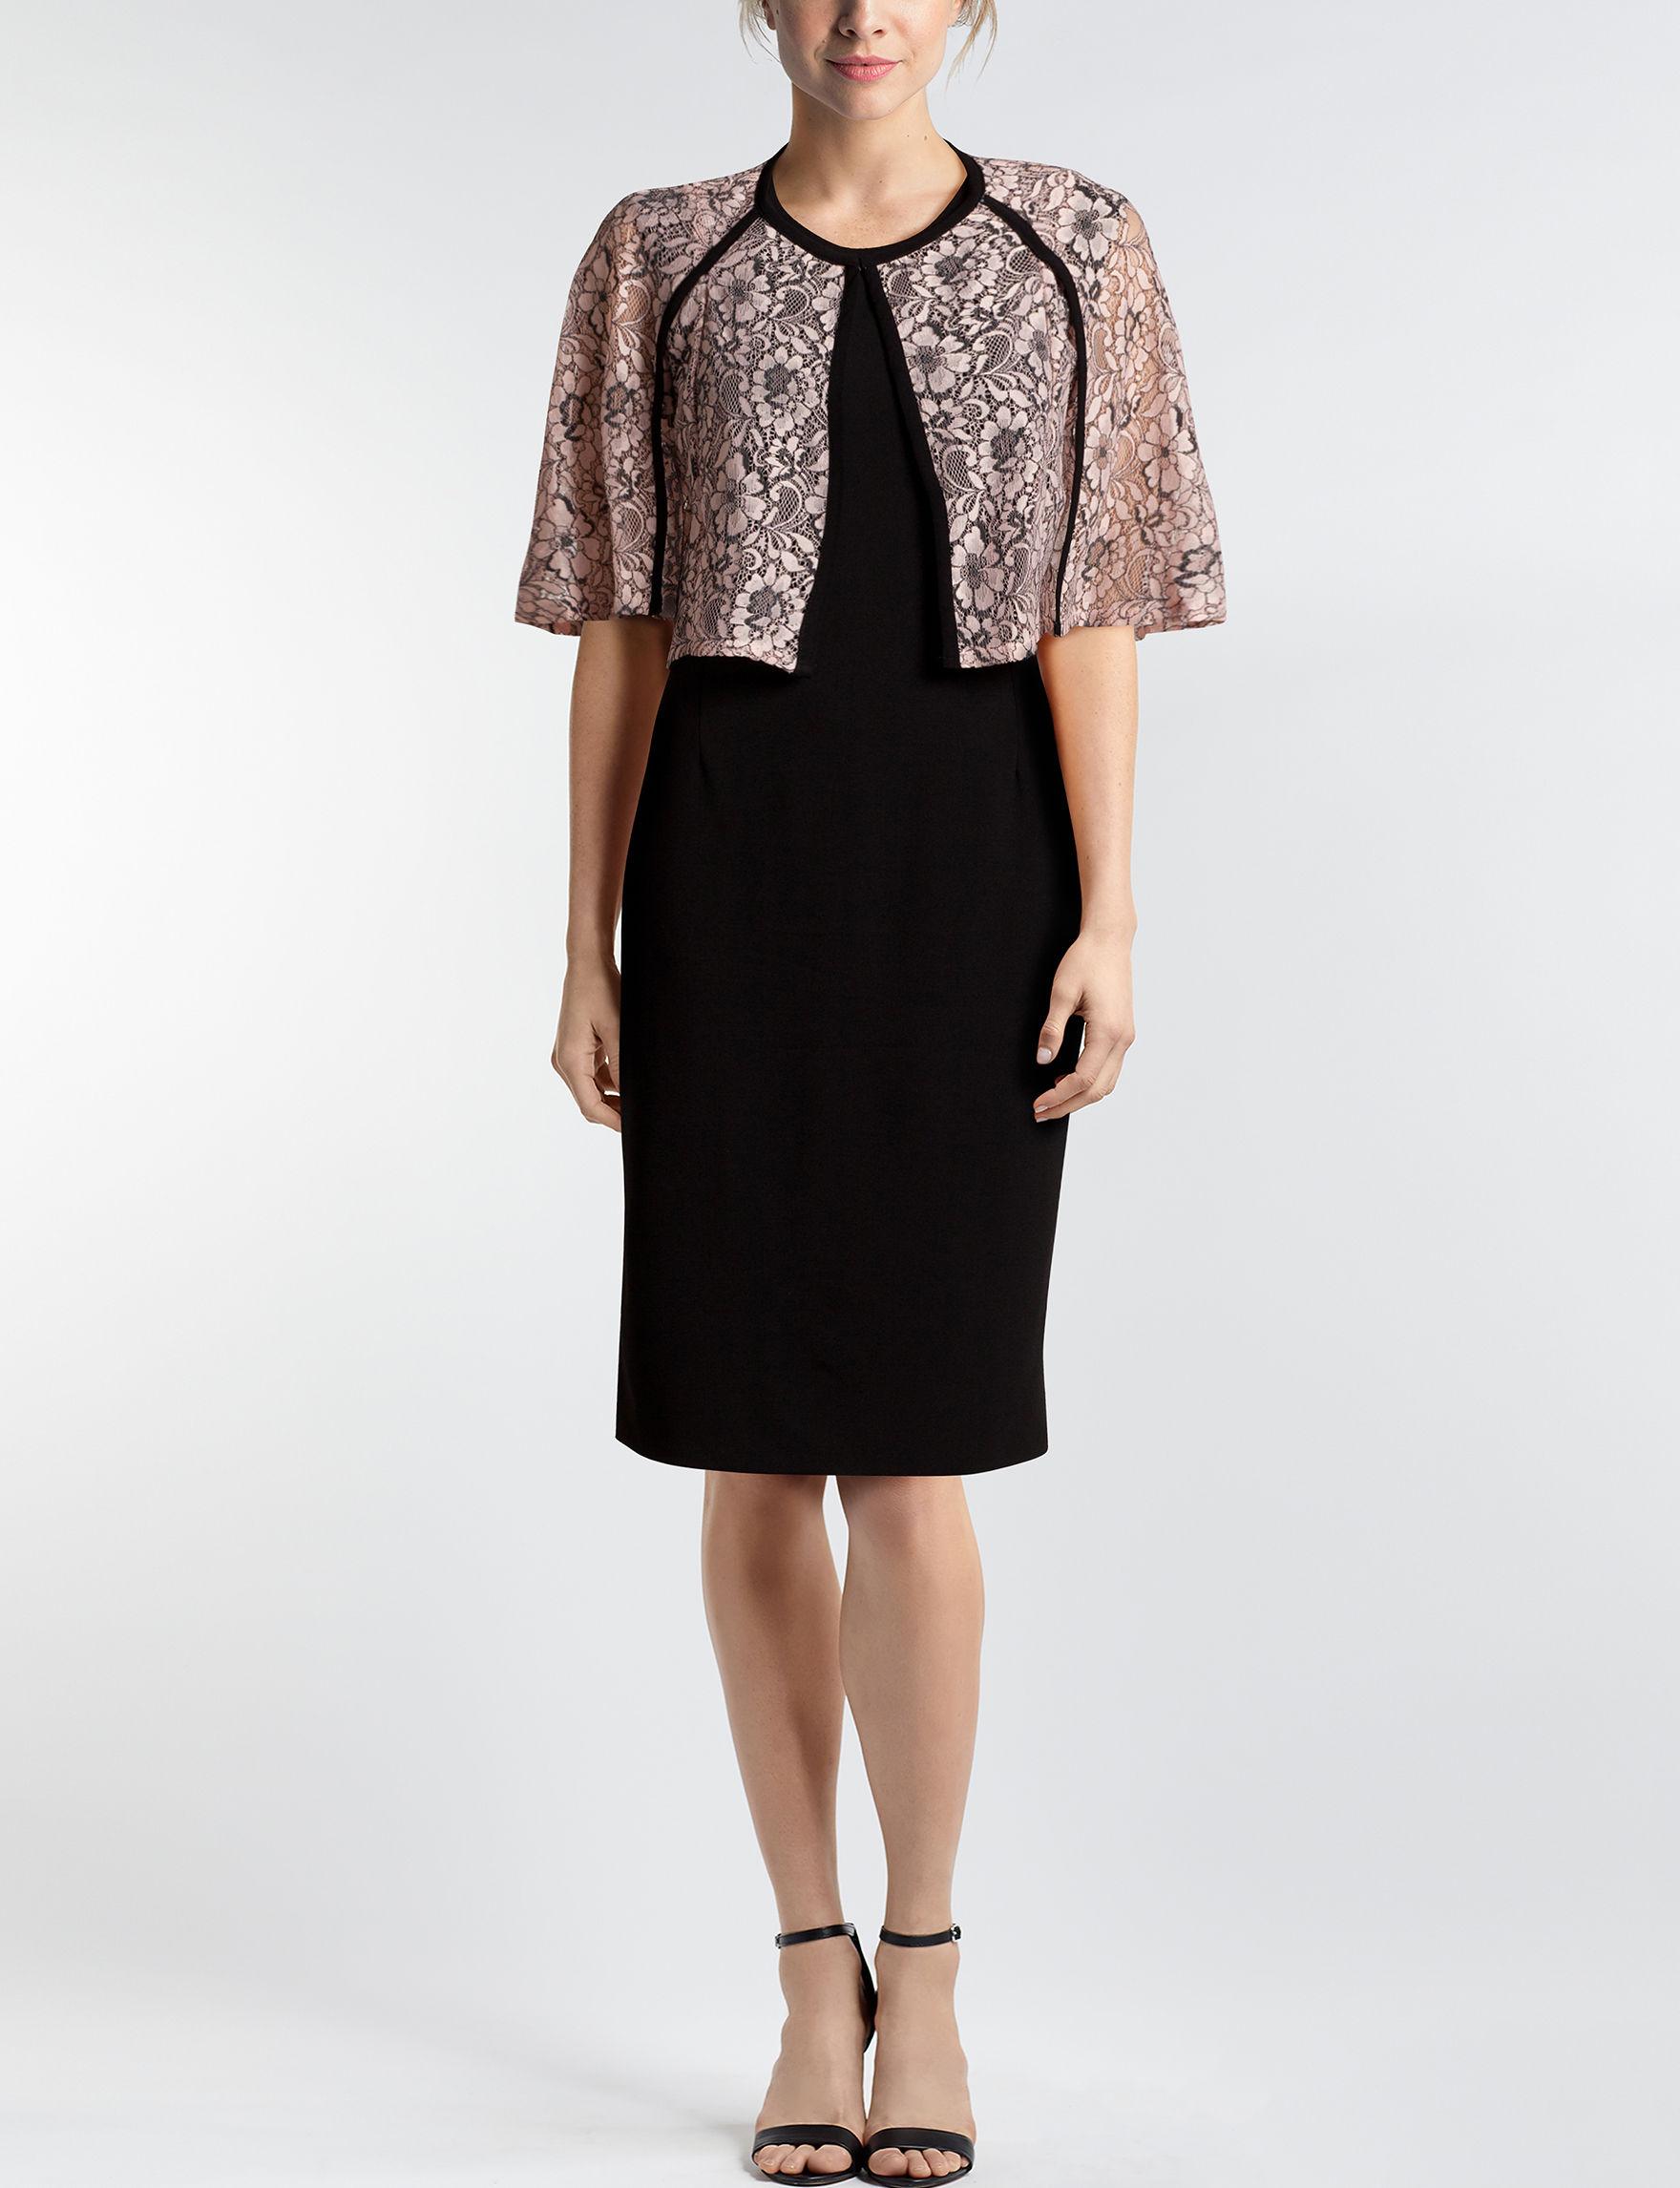 JM Studio Black Everyday & Casual Jacket Dresses Sheath Dresses